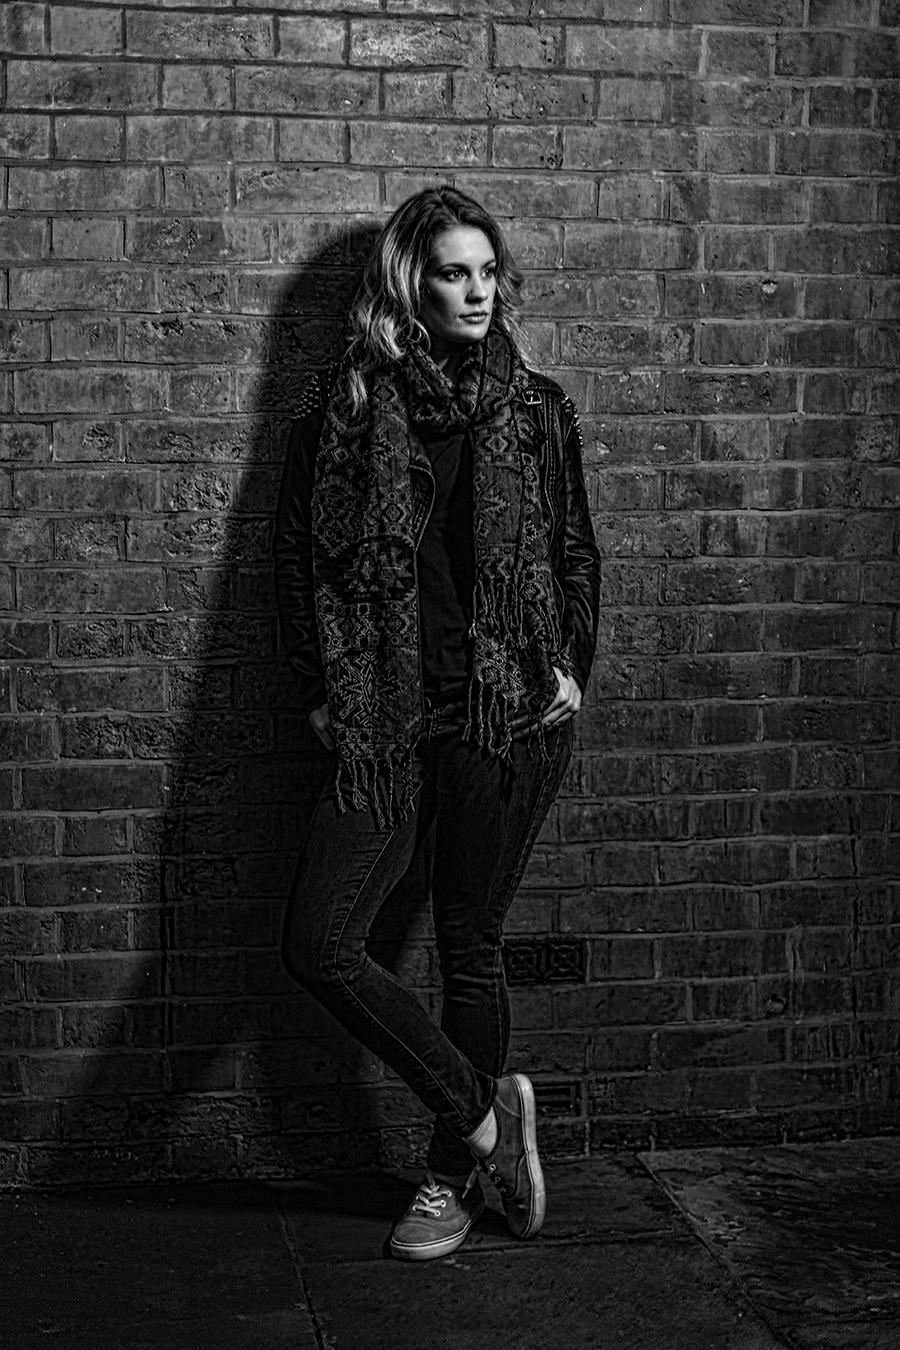 Photography by GaryMac Photography, Model Artemis Fauna / Uploaded 5th November 2015 @ 01:07 AM